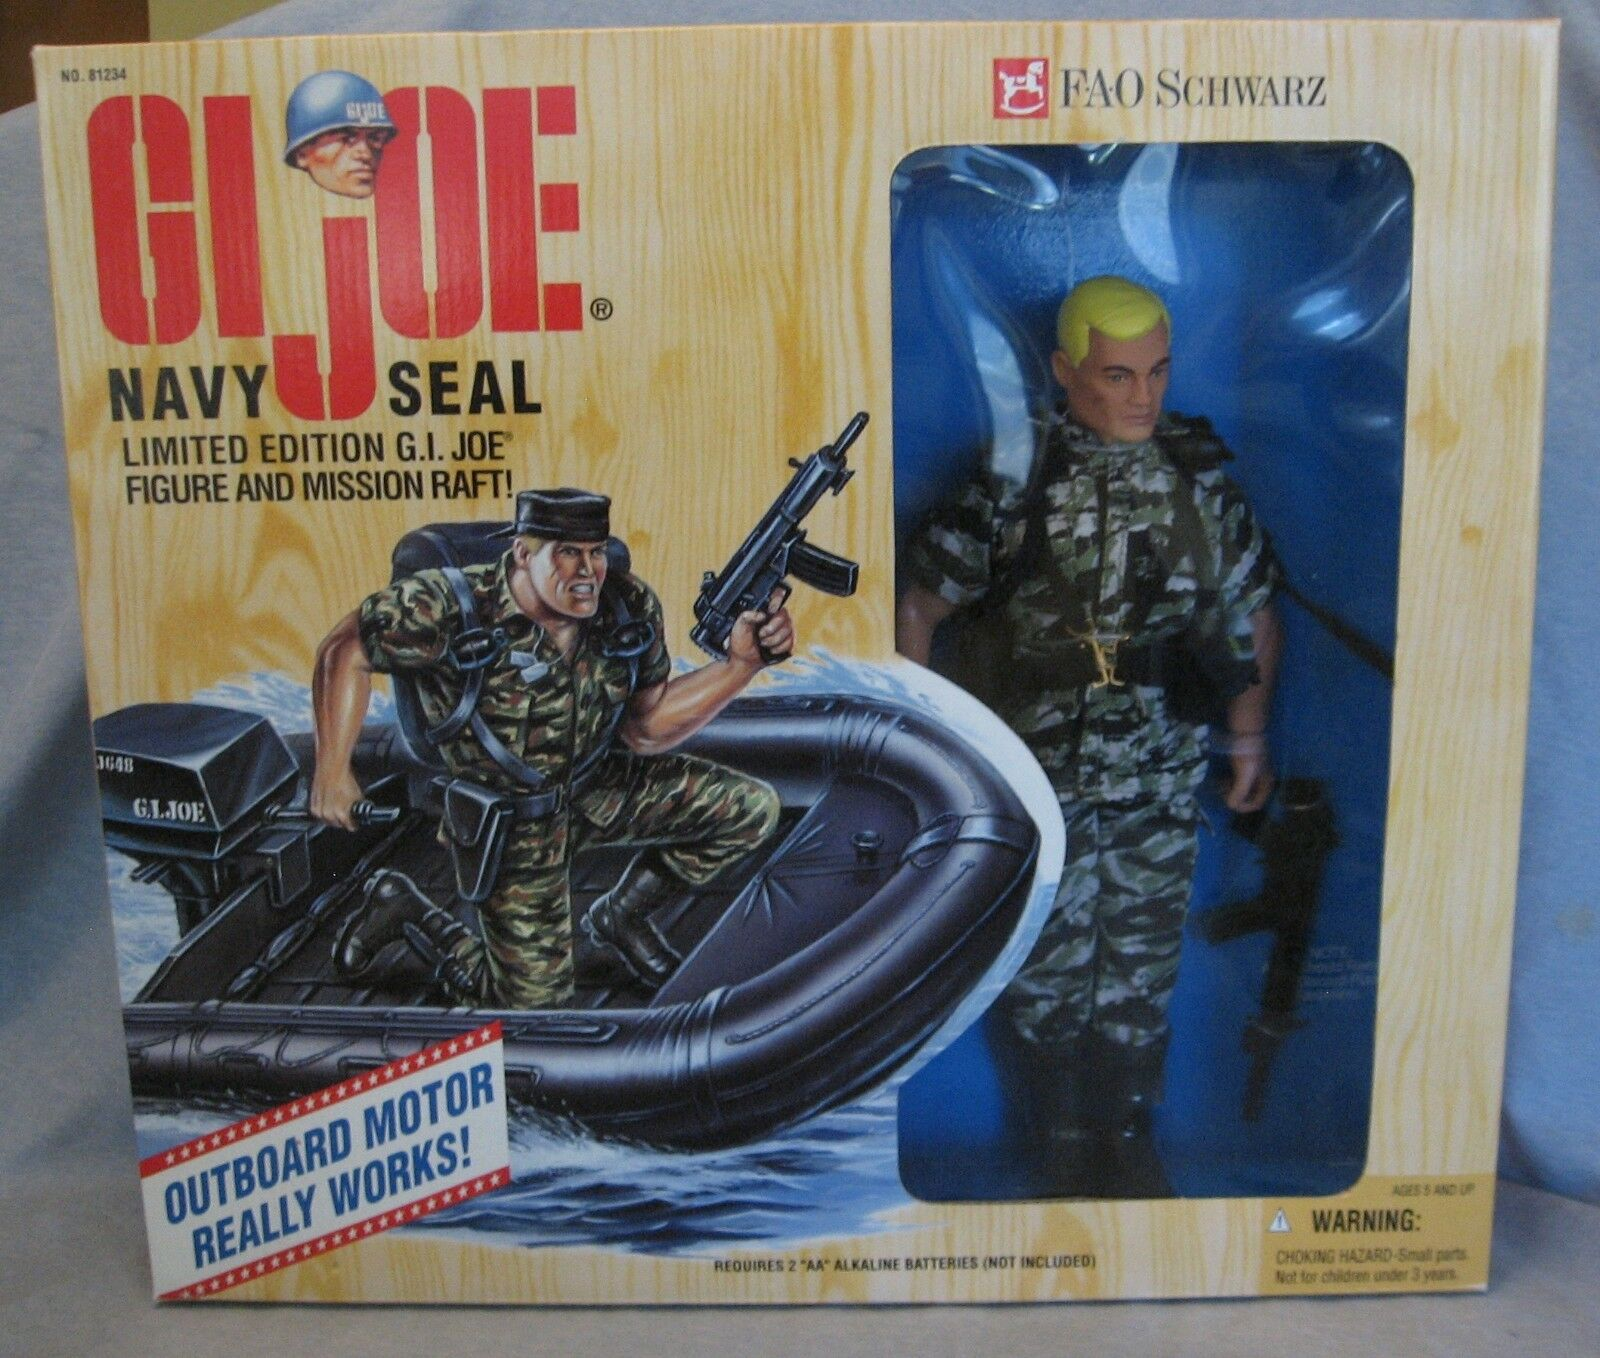 1995 GI Joe Navy Seal Limited Edition Edition Edition Set FAO black NIB Excellent Condition ca5144